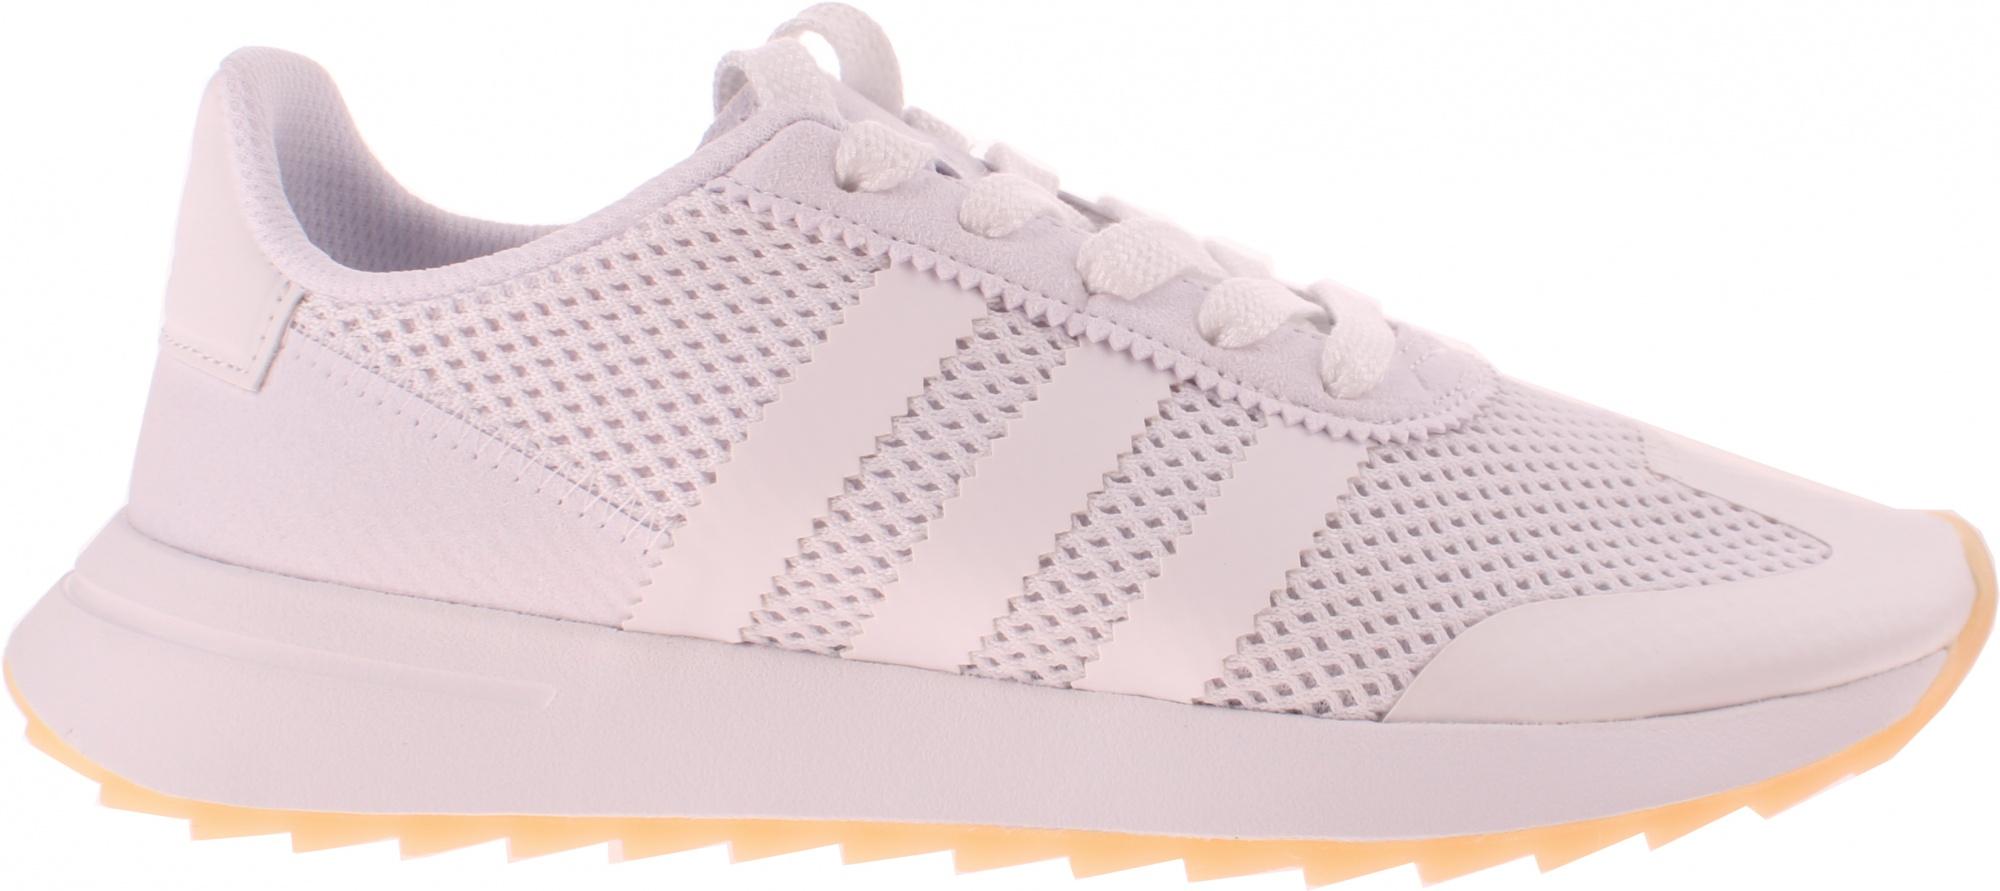 the best attitude 112e8 c8228 adidas sneakers Flashback ladies white. Enlarge